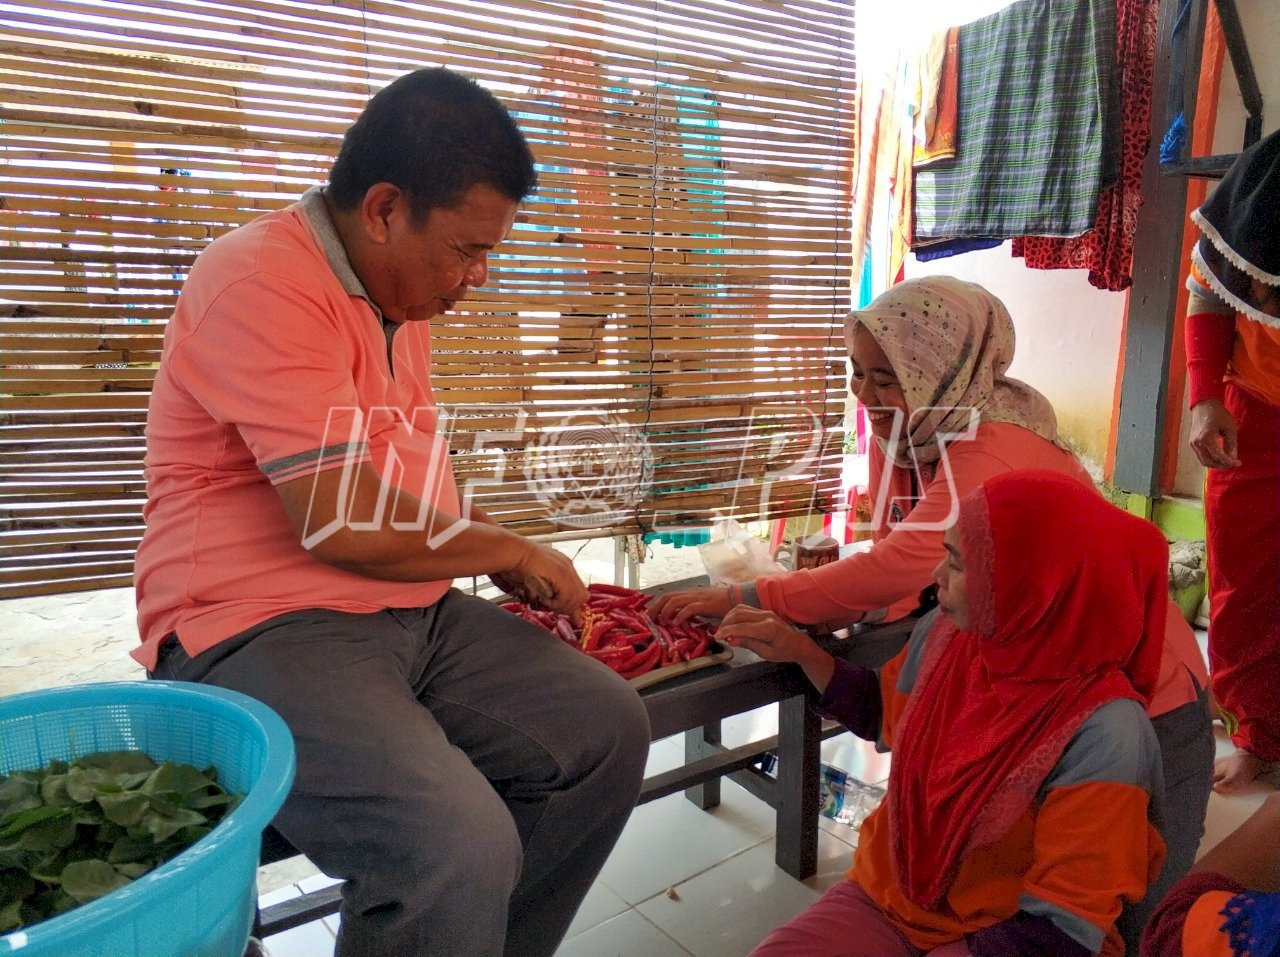 Lapas Watampone Bina WBP Perempuan Dengan Kegiatan Masak-Memasak